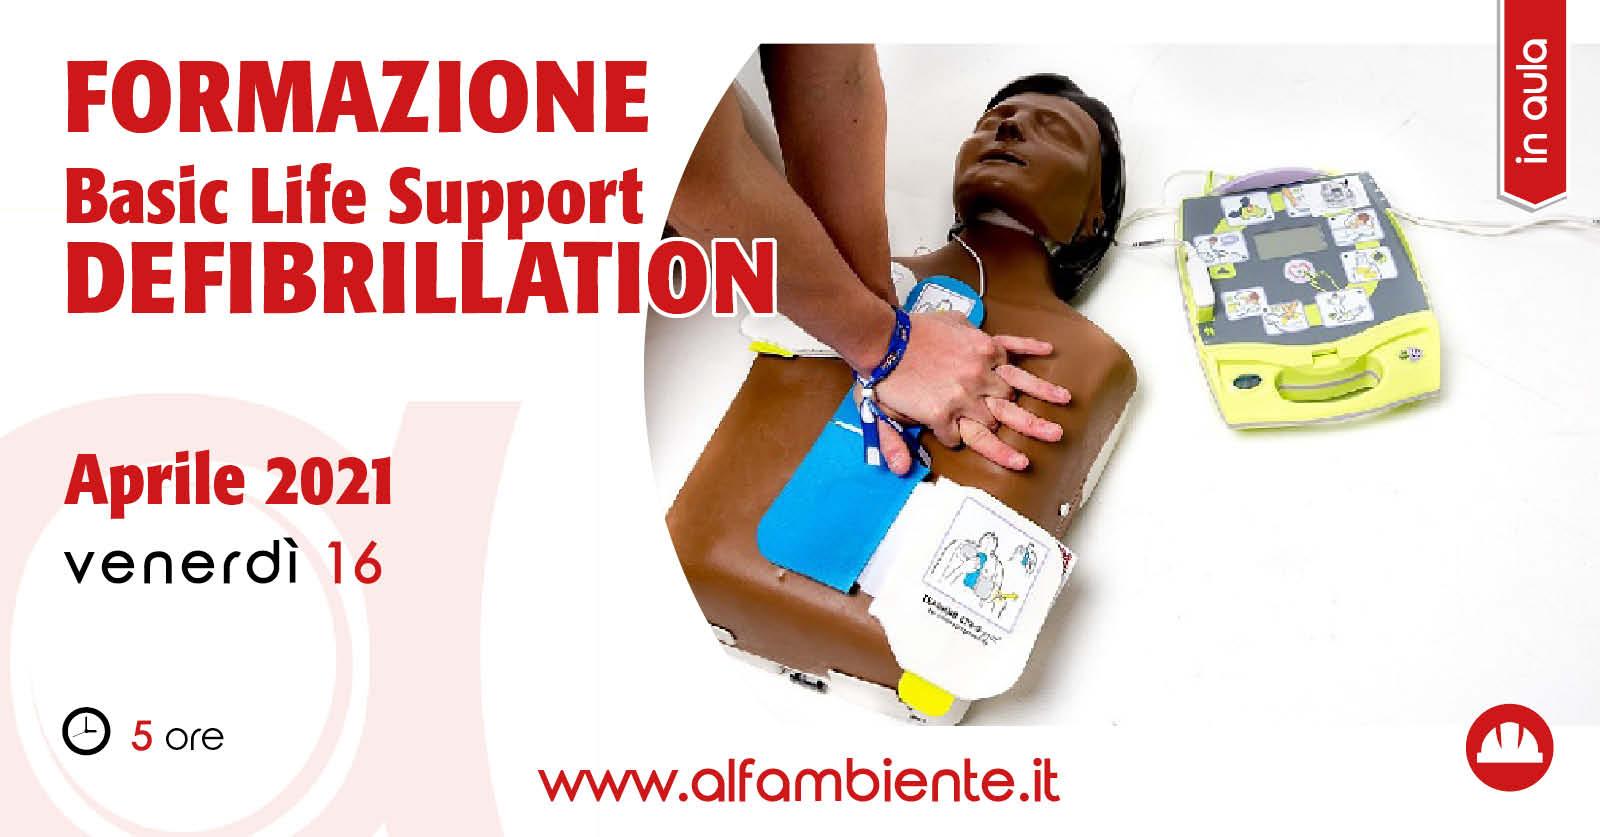 Formazione BLSD (Basic Life Support - Defibrillation)